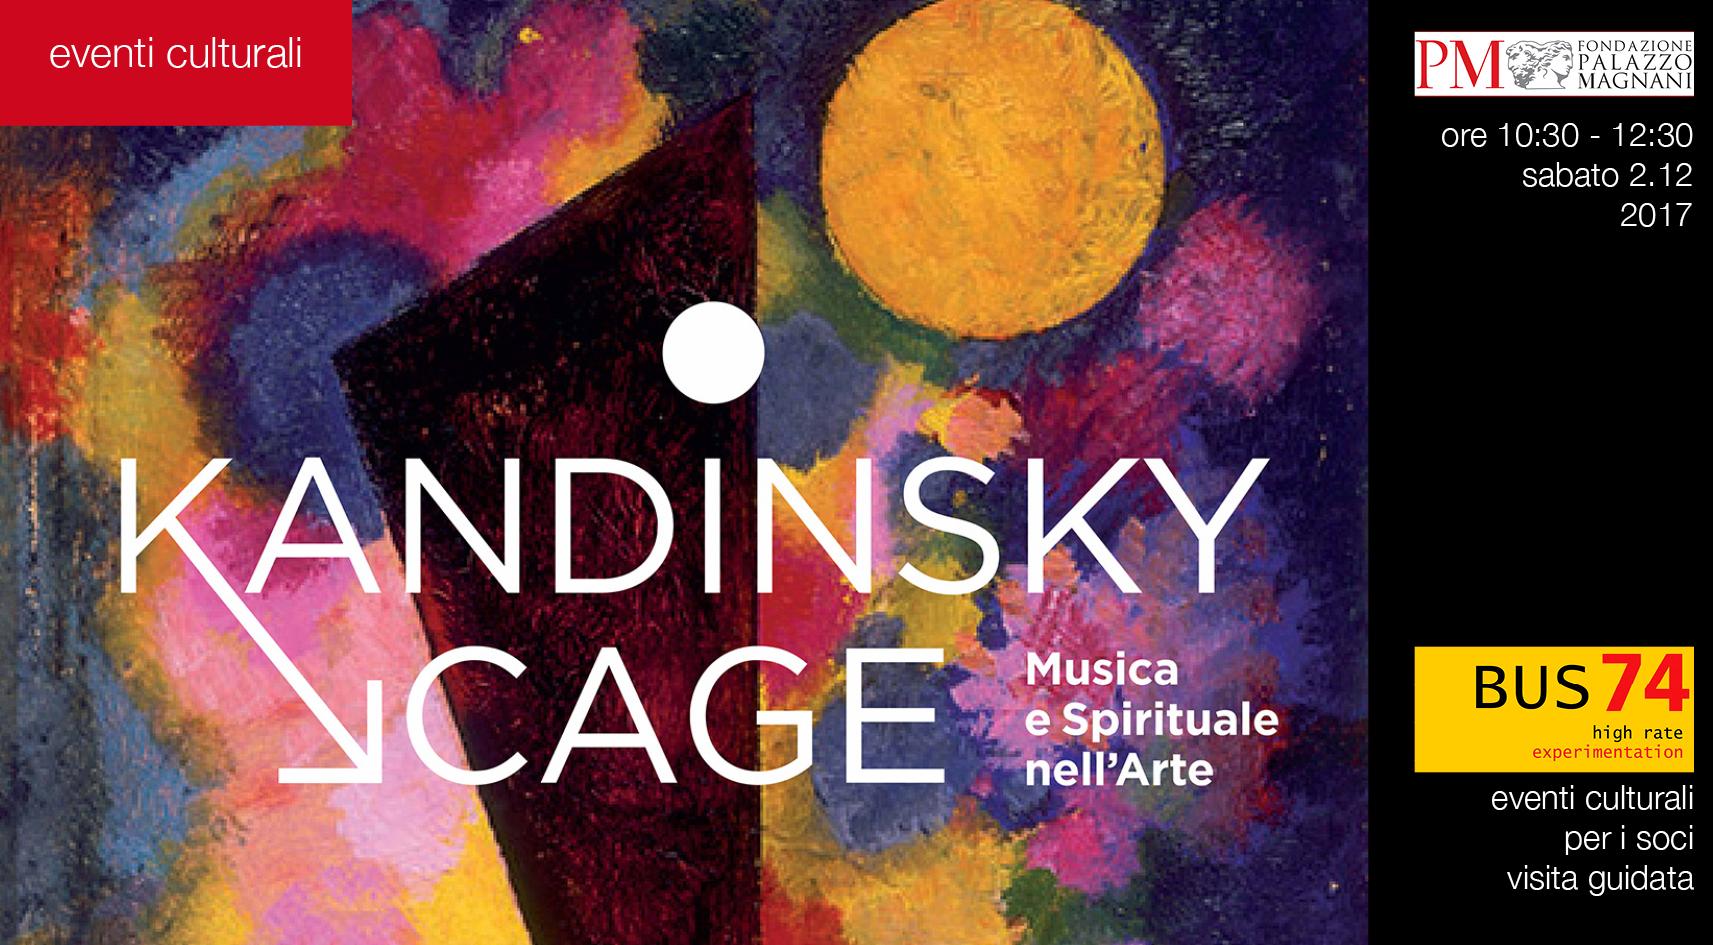 Kandinsky - Cage